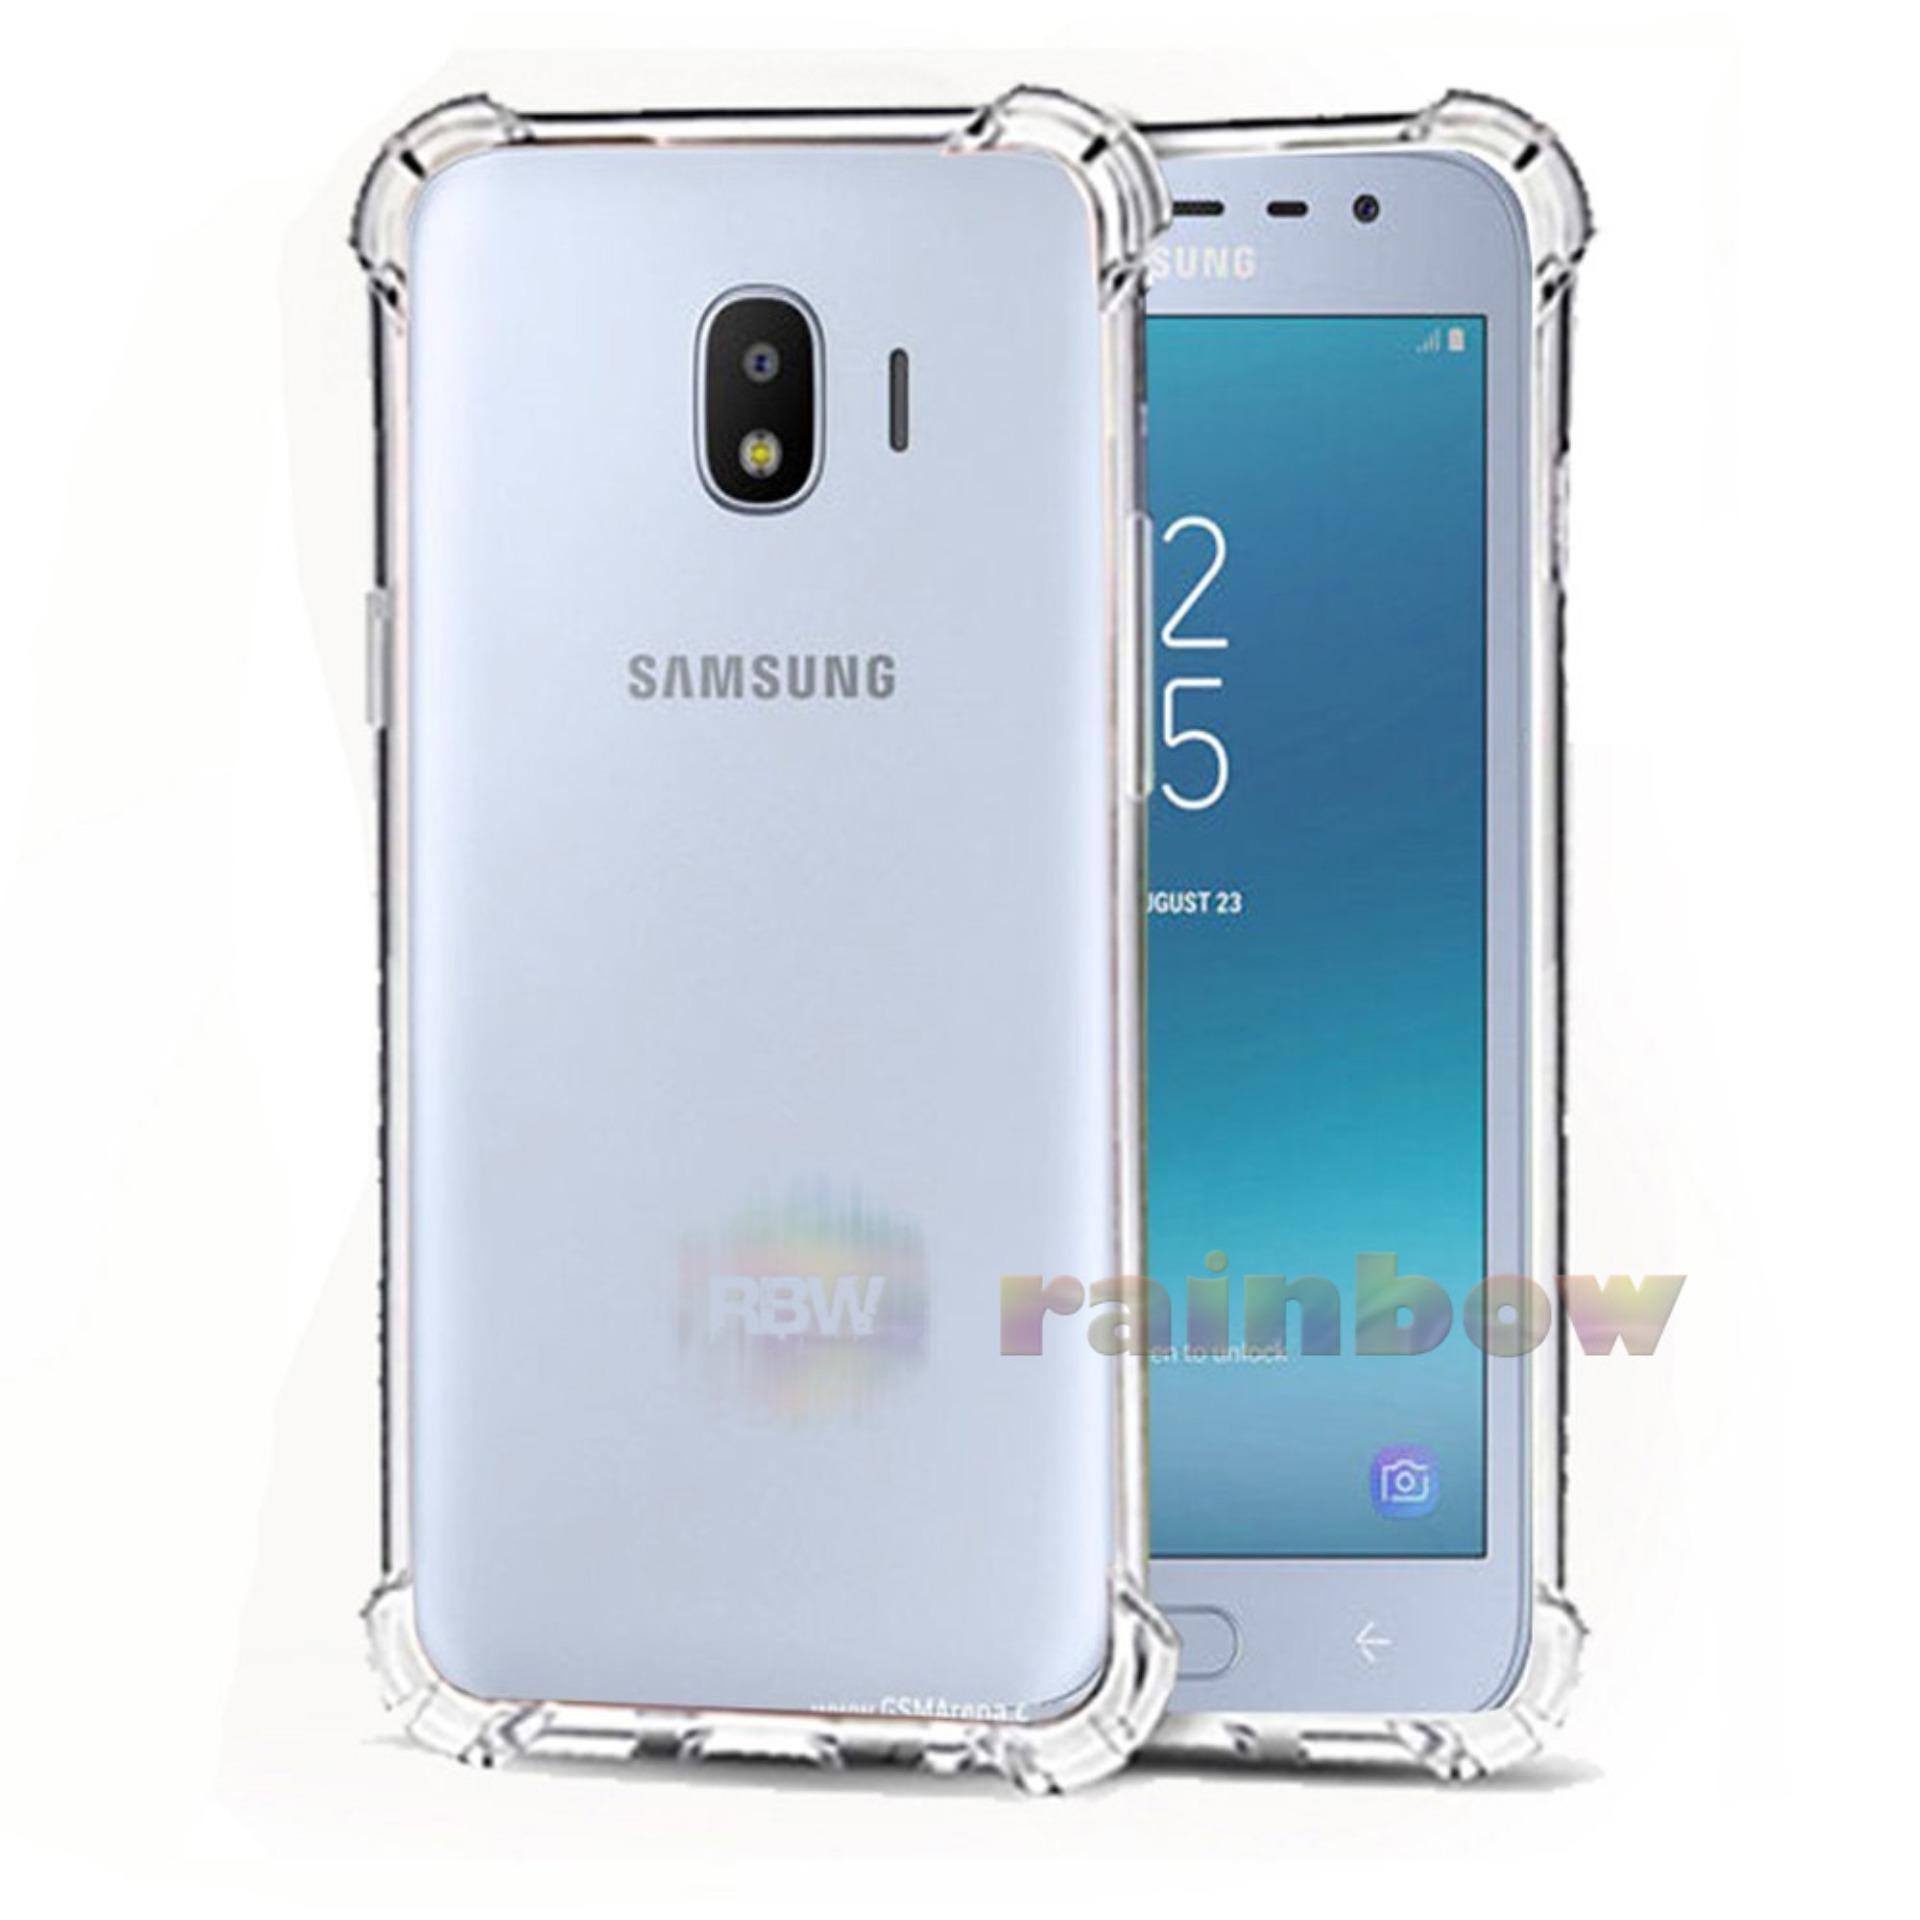 Rainbow Soft Case Anti Crack Samsung Galaxy J4 2018 Shockproof Anti Shock Samsung J4 2018 /